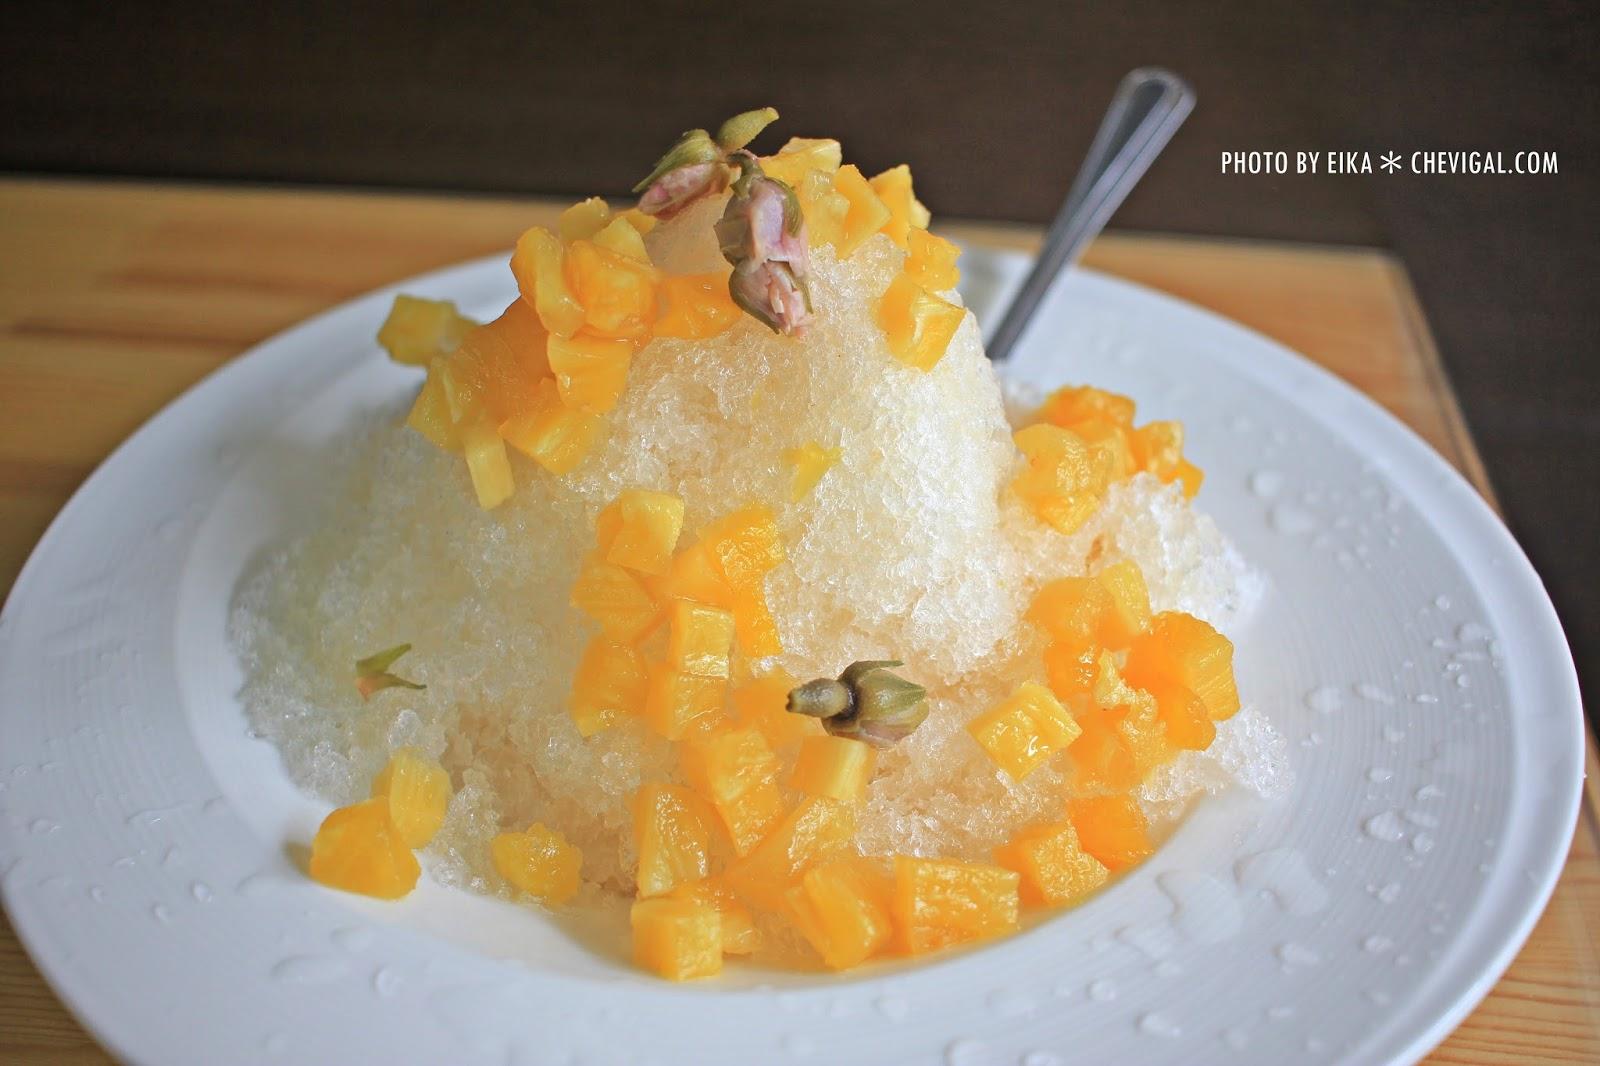 IMG 0145 - 蔡冰甜品。雪山上的愛情最純粹。全台獨有的鳳梨玫瑰冰。等你來感受芬芳原味